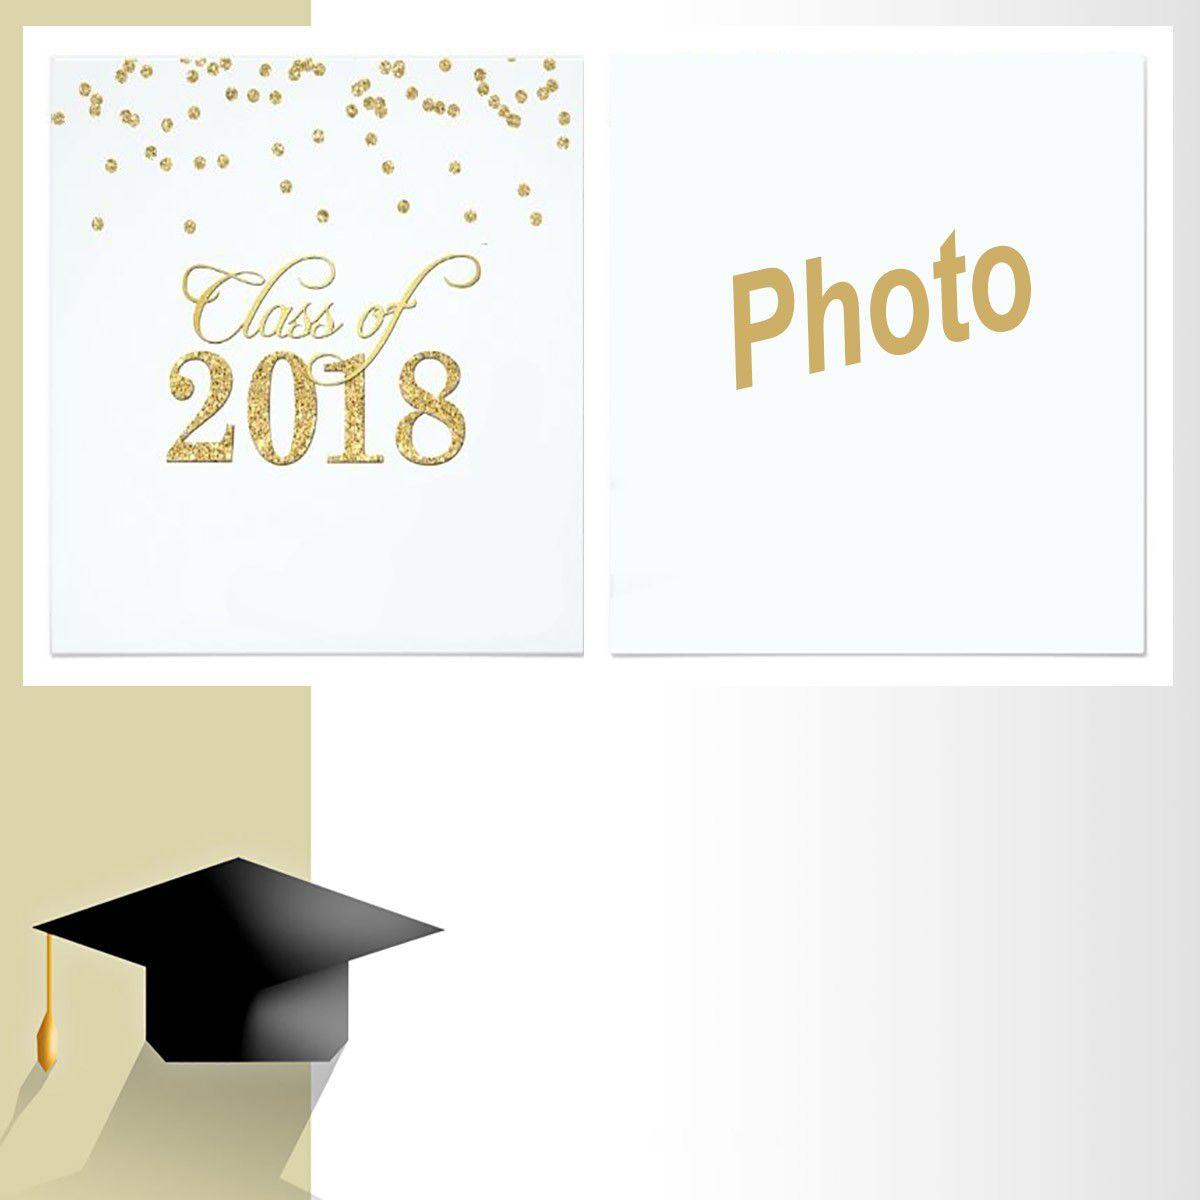 009 Phenomenal Free Graduation Announcement Template Sample  Templates For Word MicrosoftFull